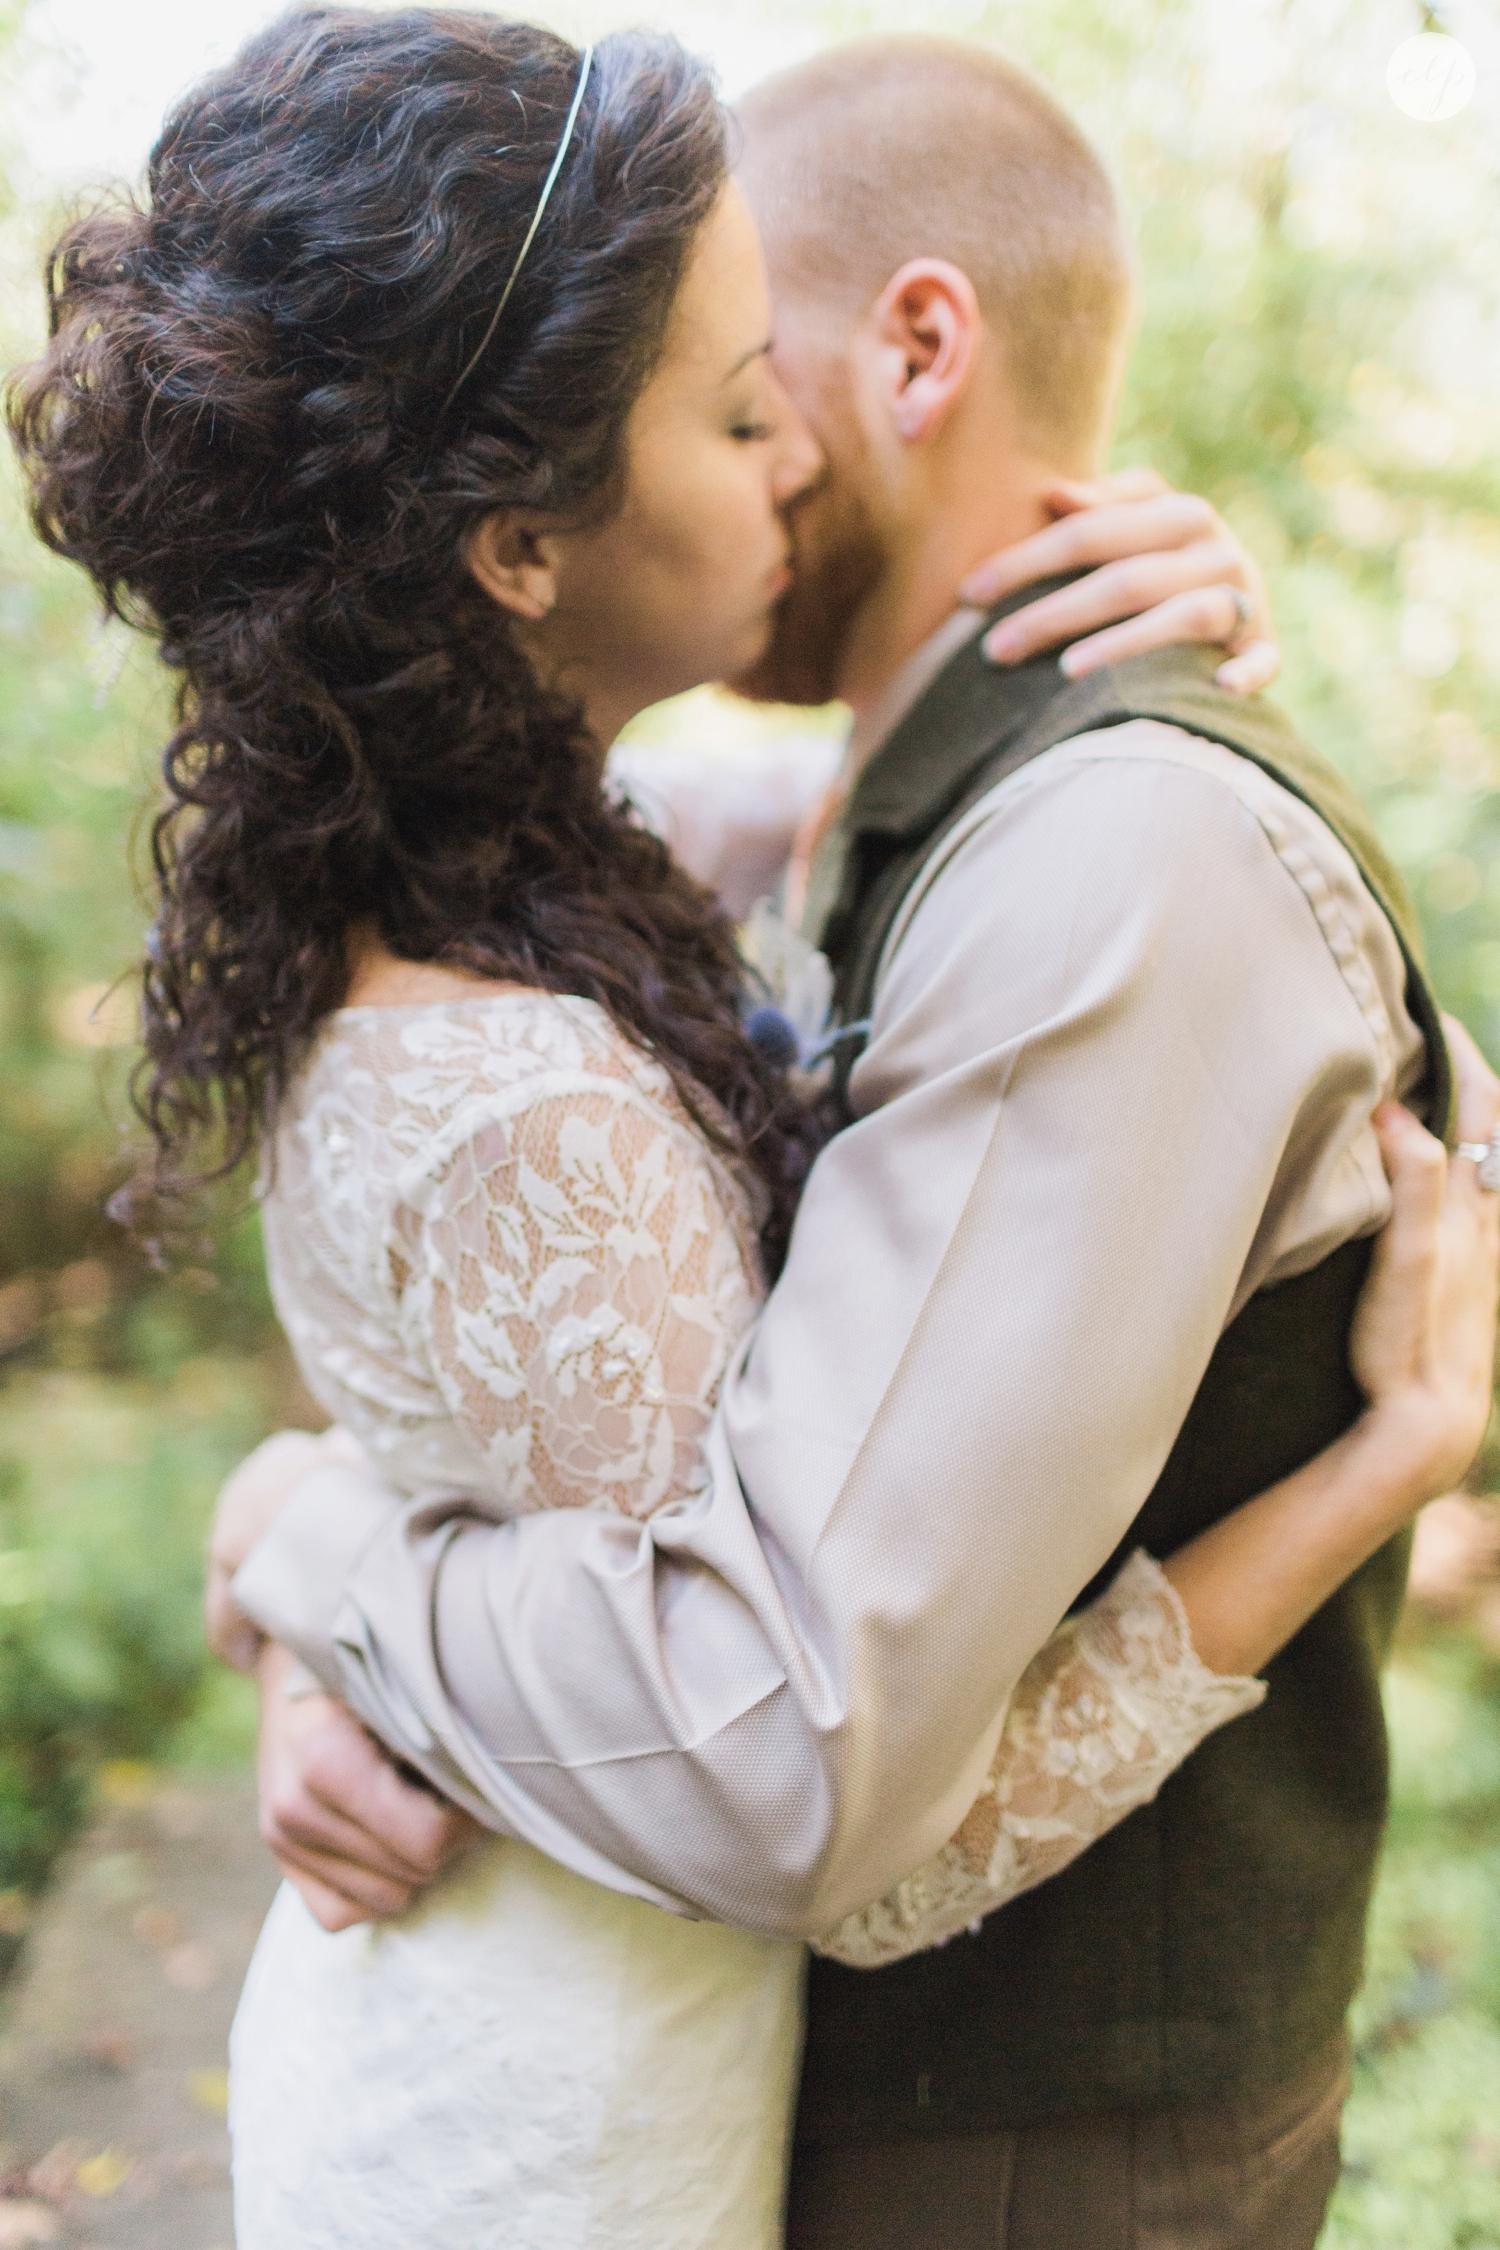 Outdoor-Wedding-in-the-Woods-Photography_4229.jpg